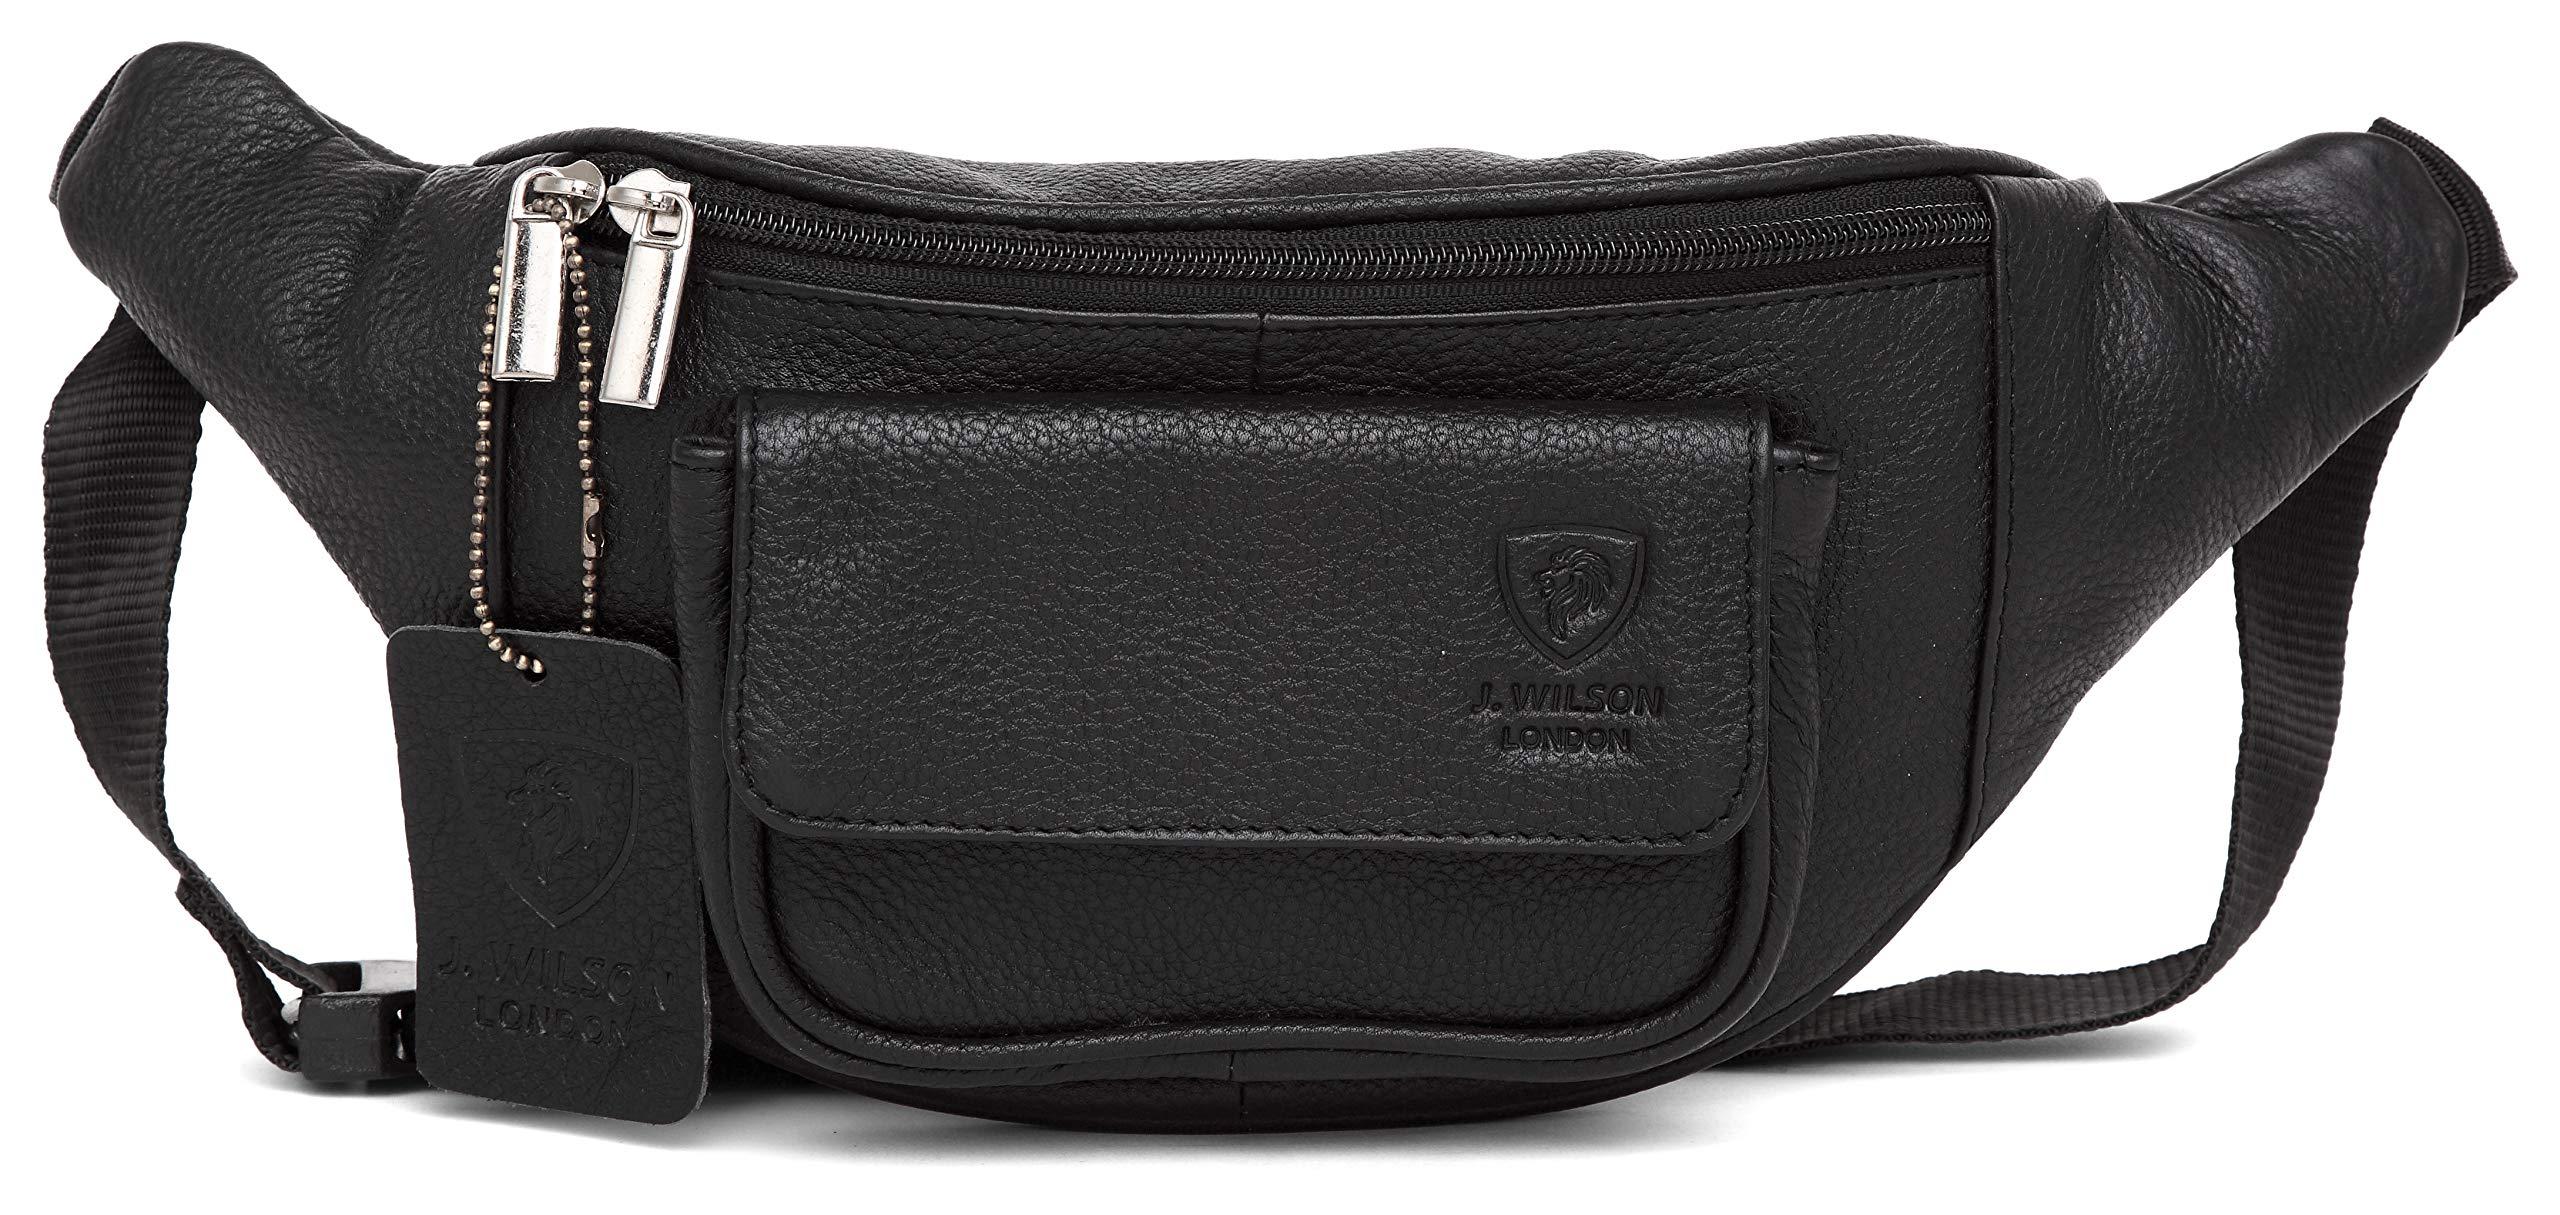 Unisex Soft Black Real Small Leather Bum Bag Money Travel Holiday Waist Belt